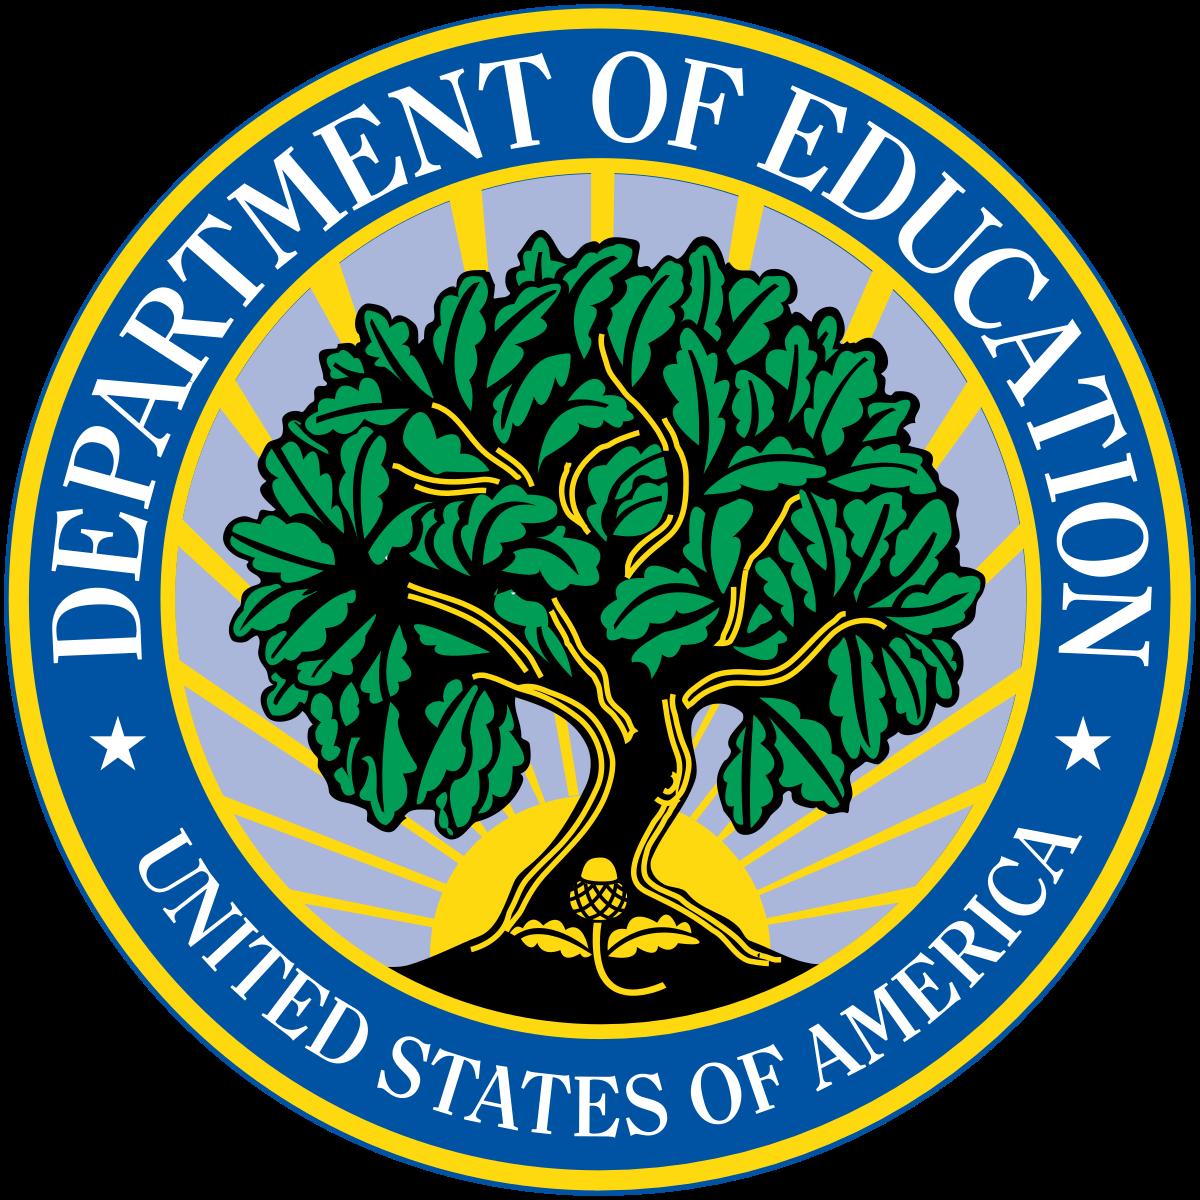 Us Dept of Ed Logo